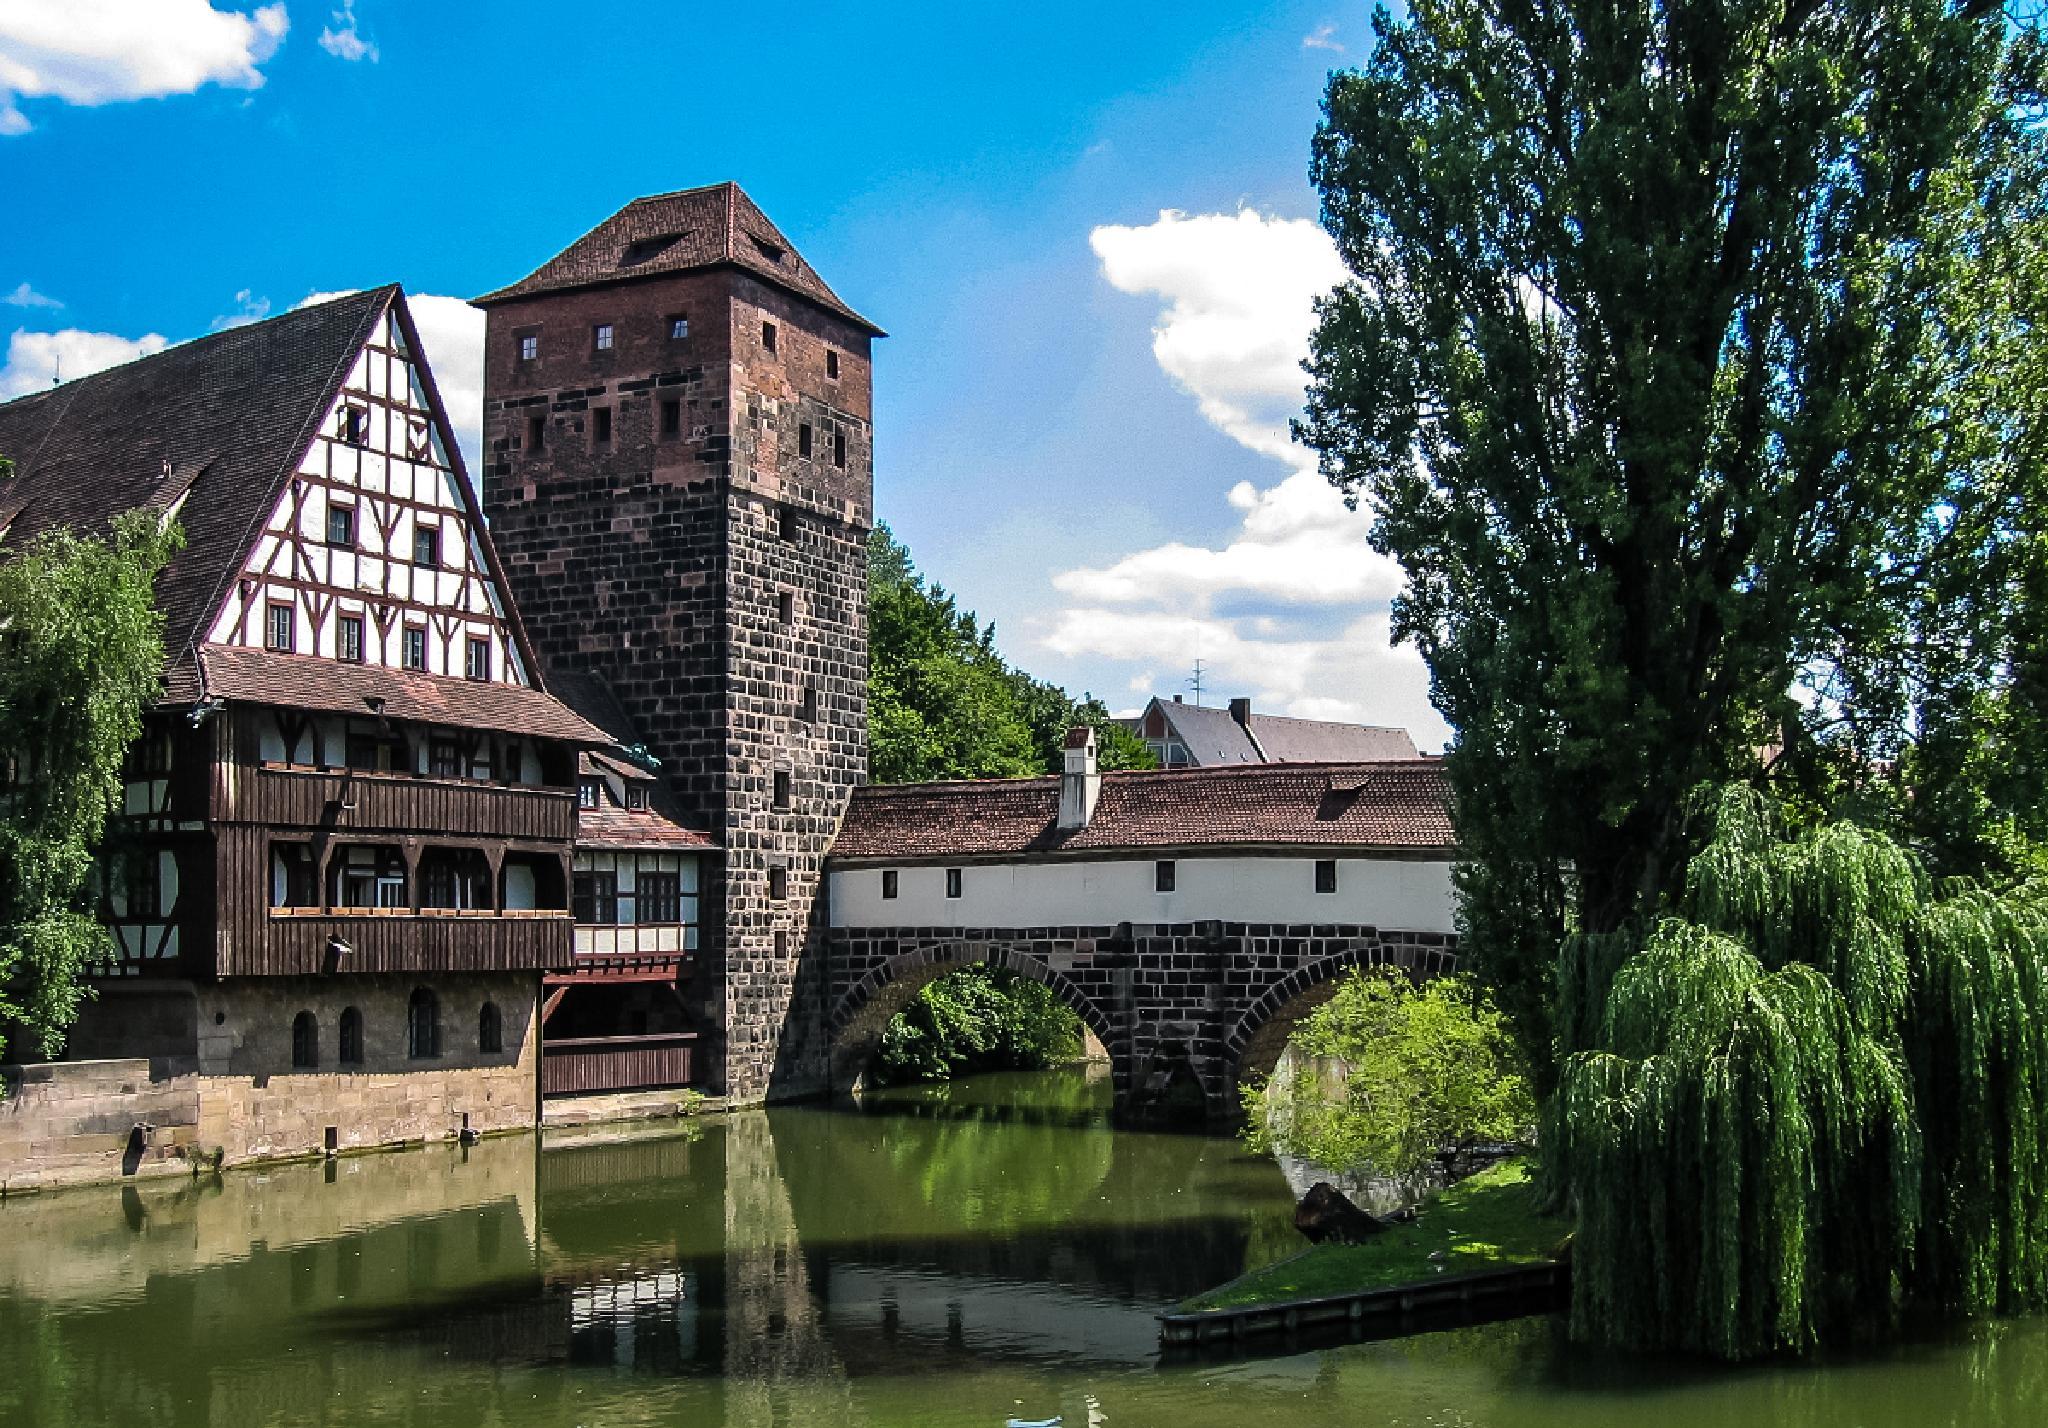 Henkerssteg, Nuremberg by FSFoto